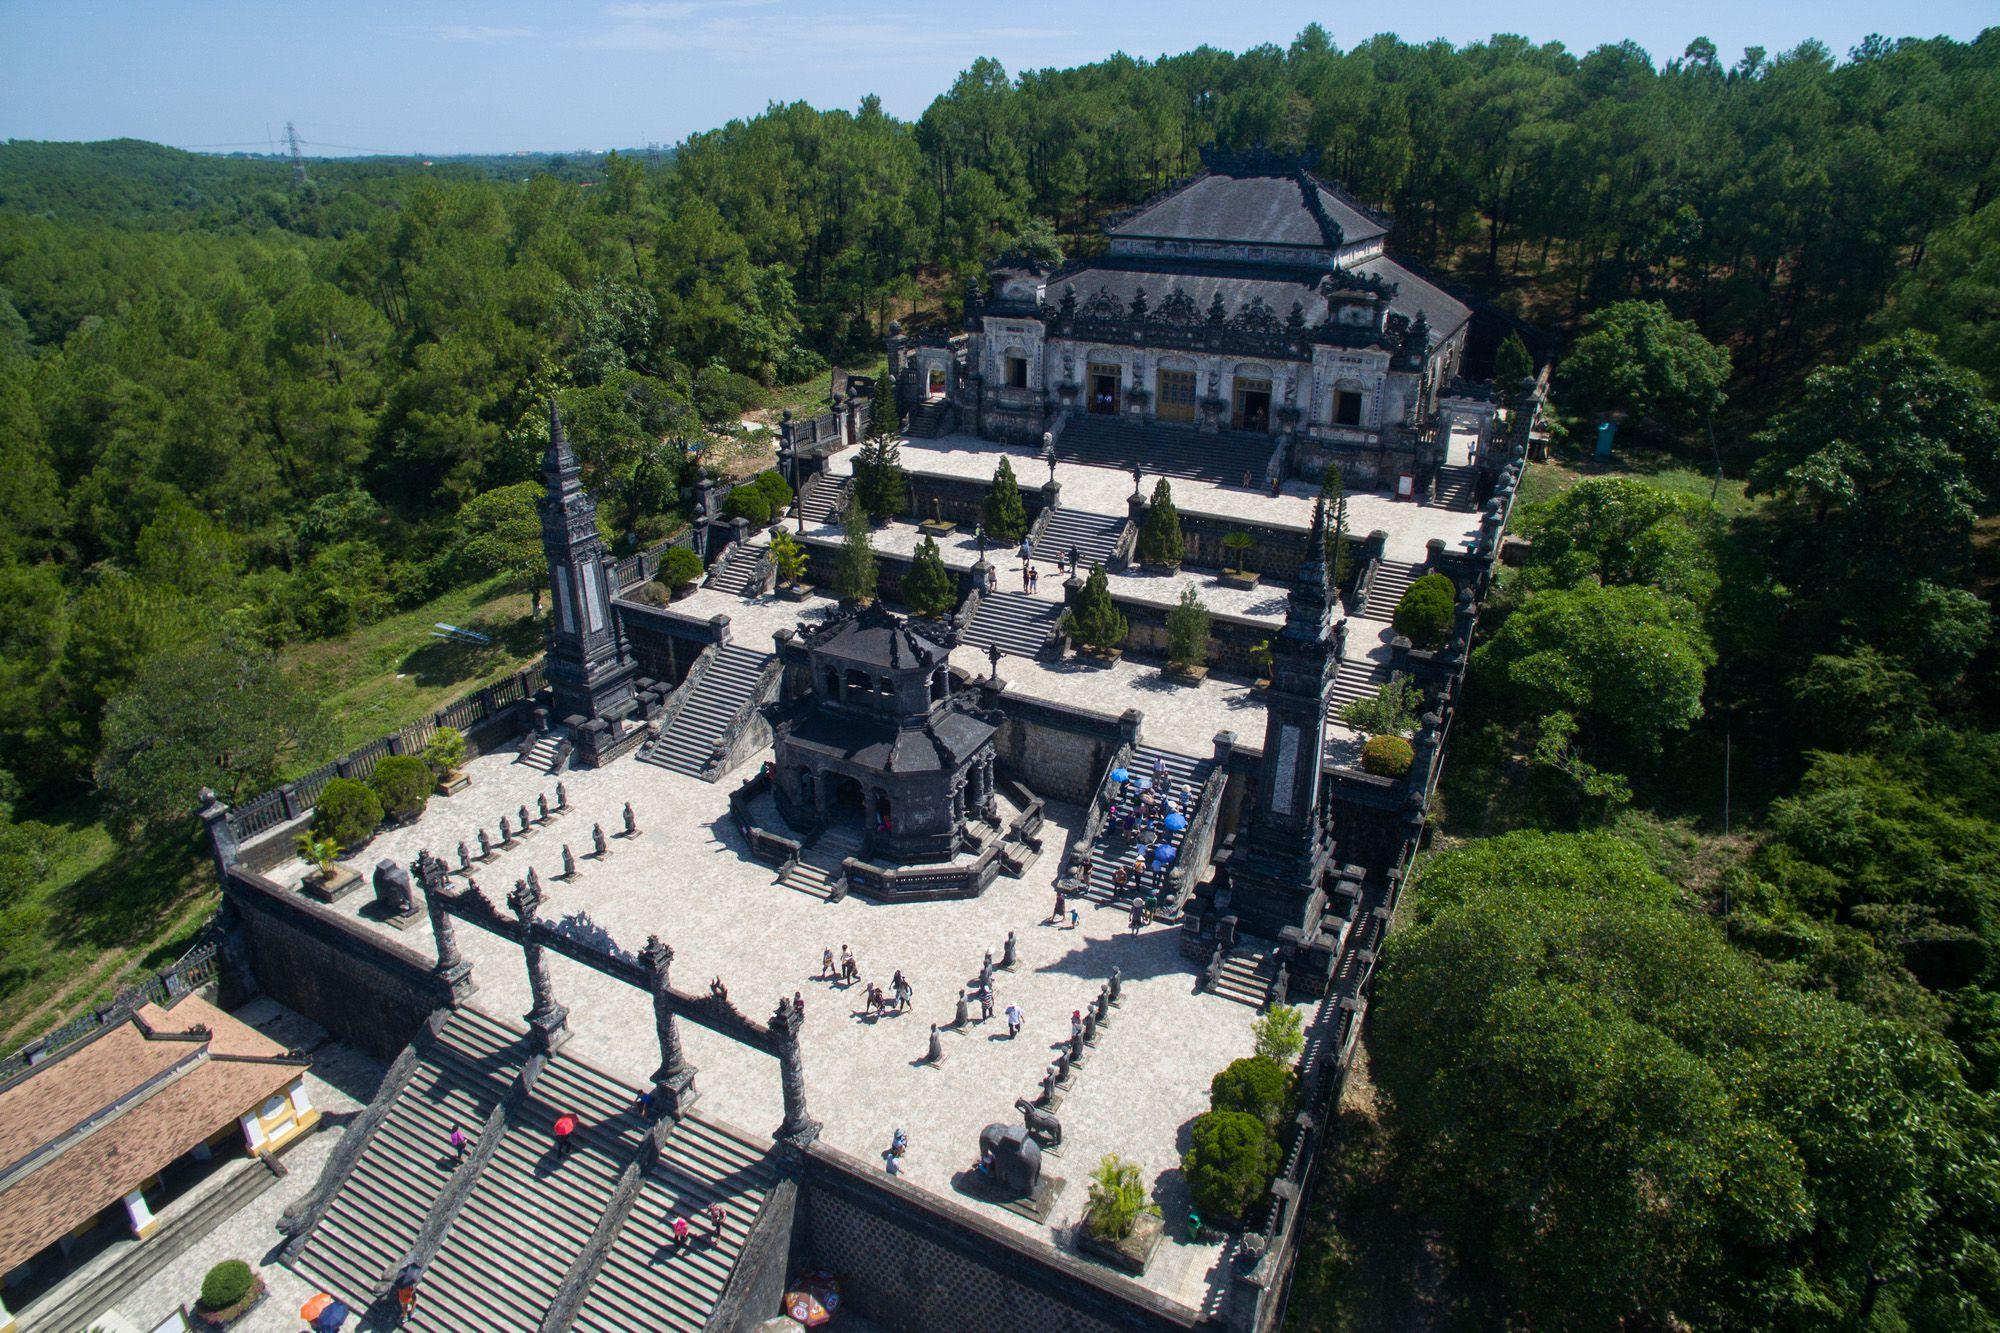 East Side Auto >> Walking Tour of Khai Dinh Royal Tomb, Hue, Vietnam